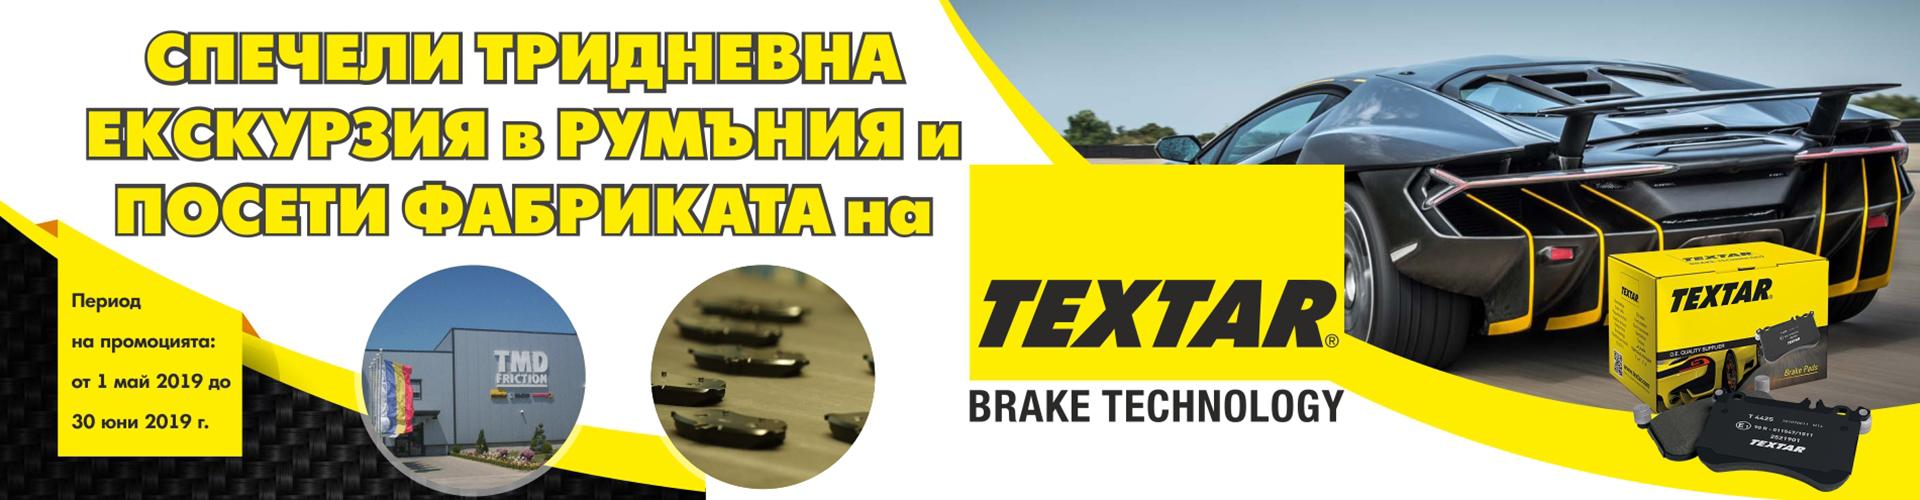 promo_textar_01052019-30062019_banner.jpg